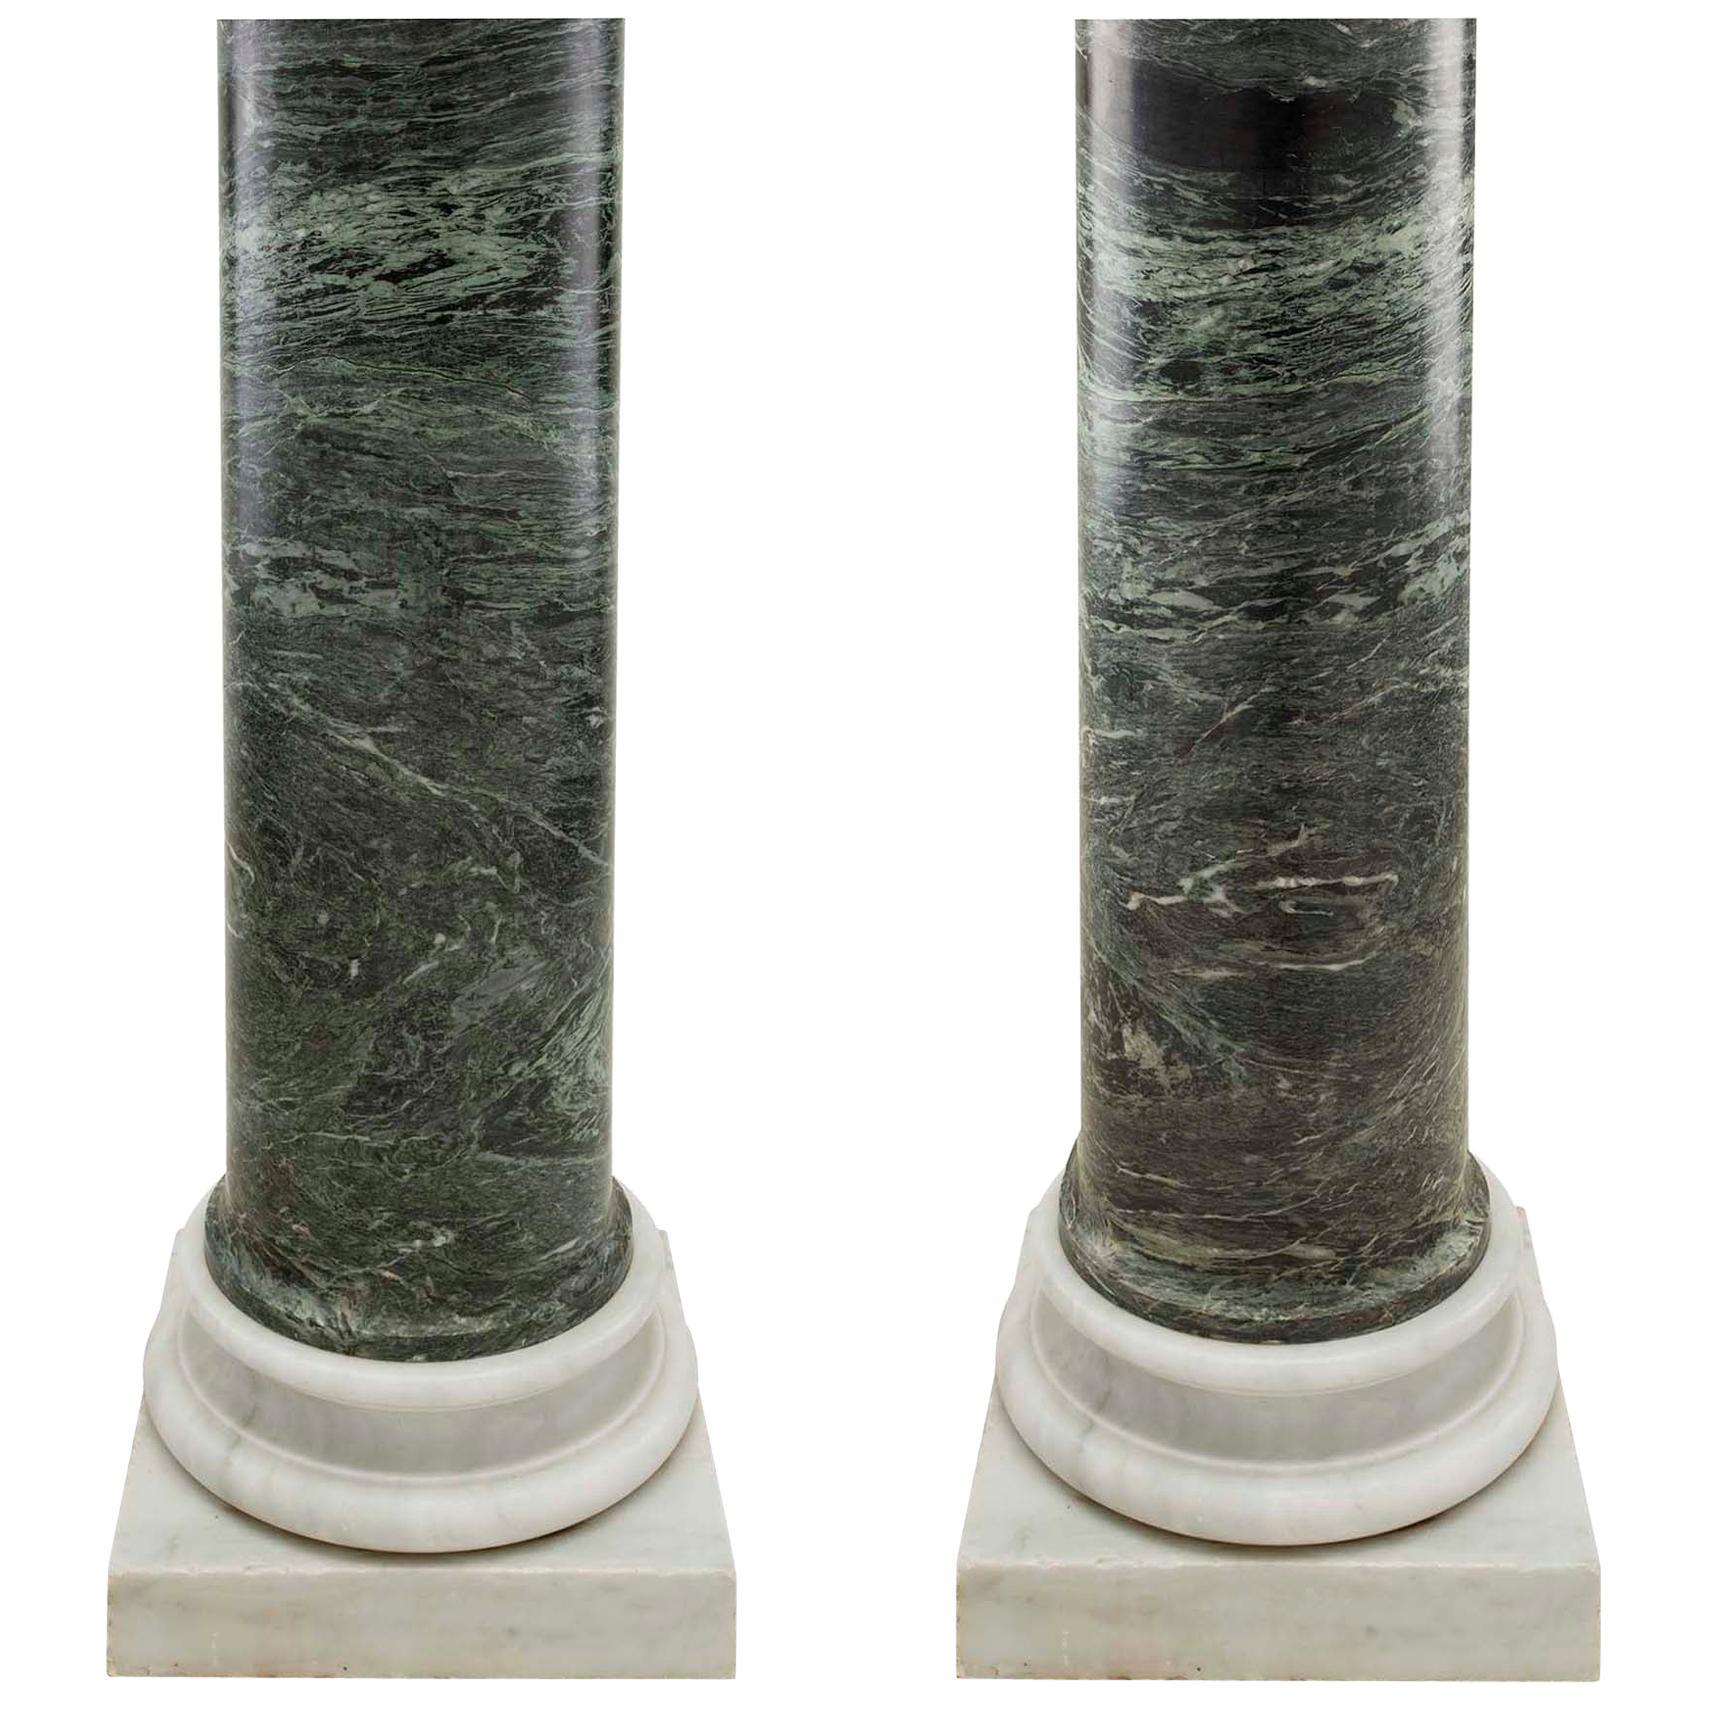 Italian 19th Century Neoclassical Style Green Marble Columns